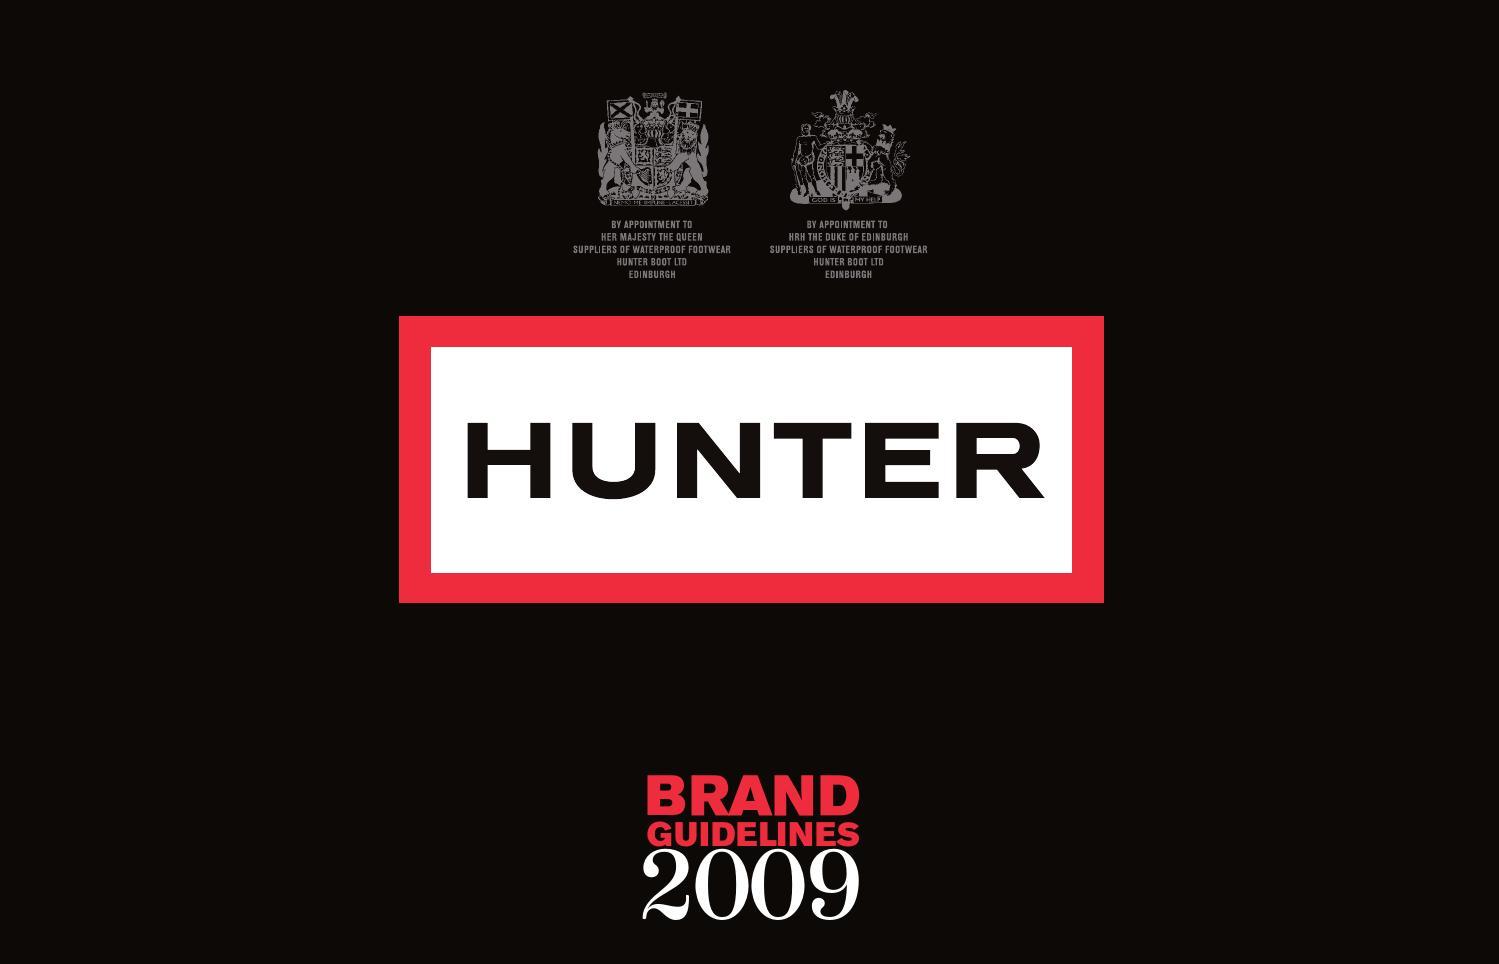 Hunter brand guidelines by SASTG - issuu